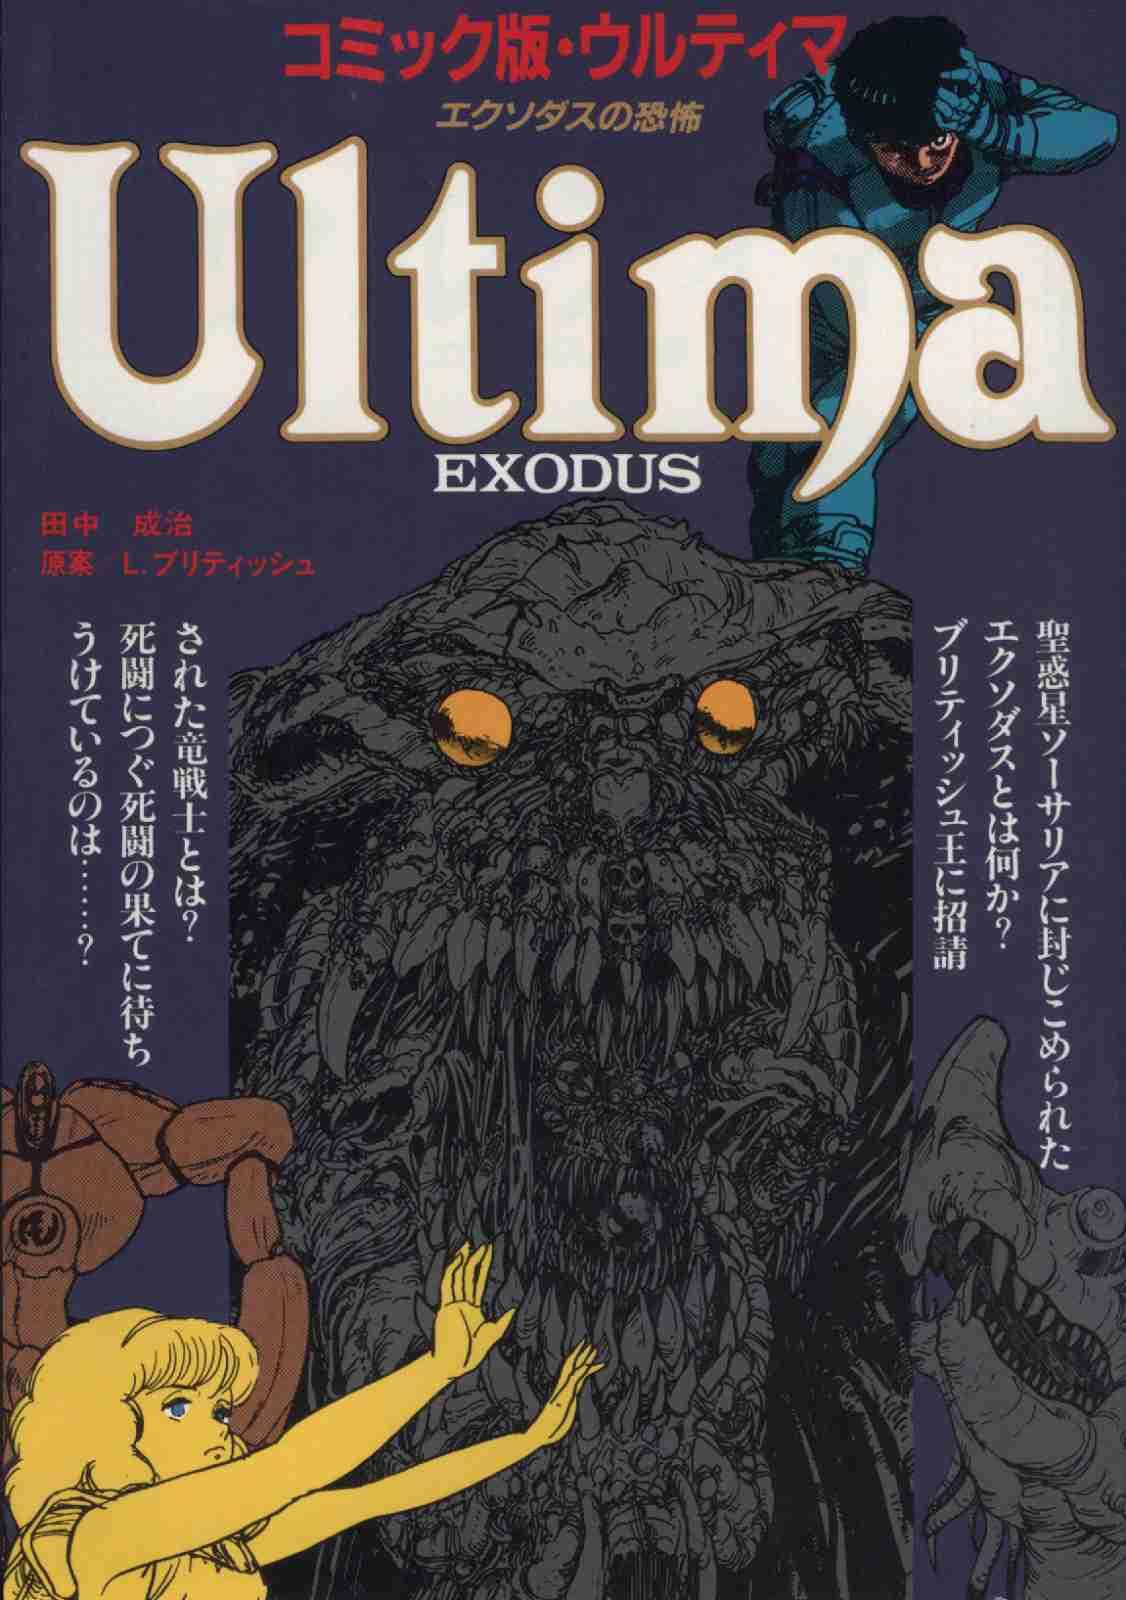 https://manga.mangadogs.com/comics/pic2/57/32953/947897/85200a8f134802dd452522a59edc9676.jpg Page 1